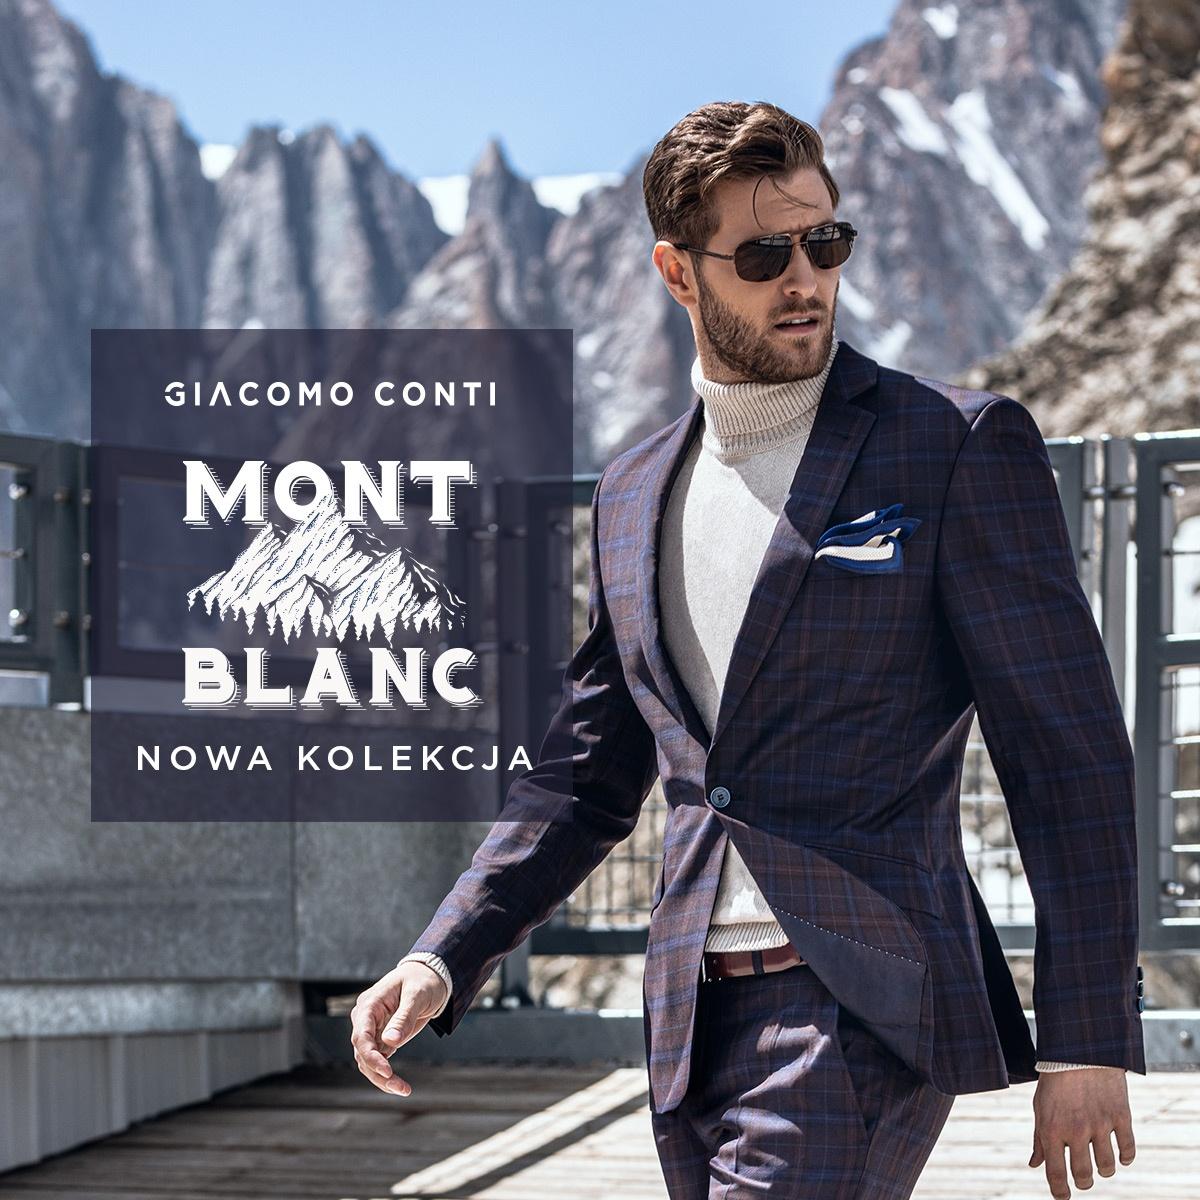 Nowa Kolekcja Mont Blanc